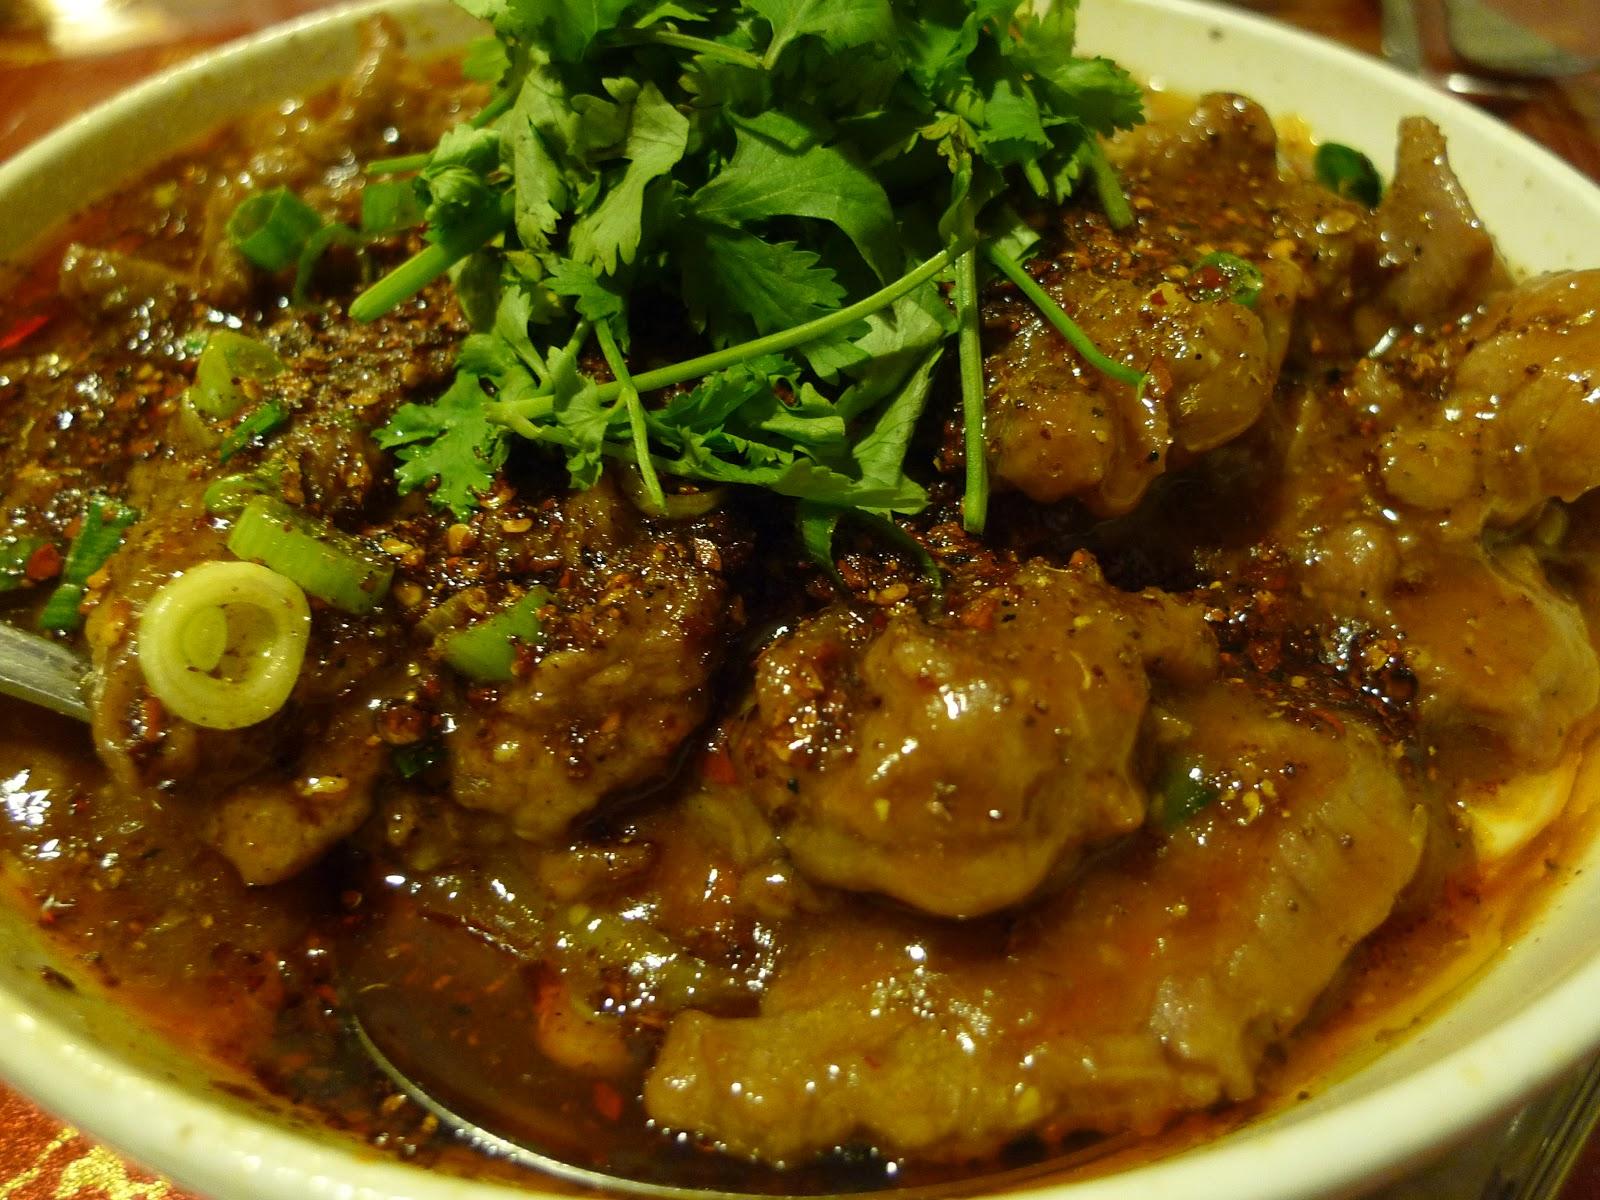 Restaurant Comparison: Legend vs. Grand Sichuan on the Upper West Side